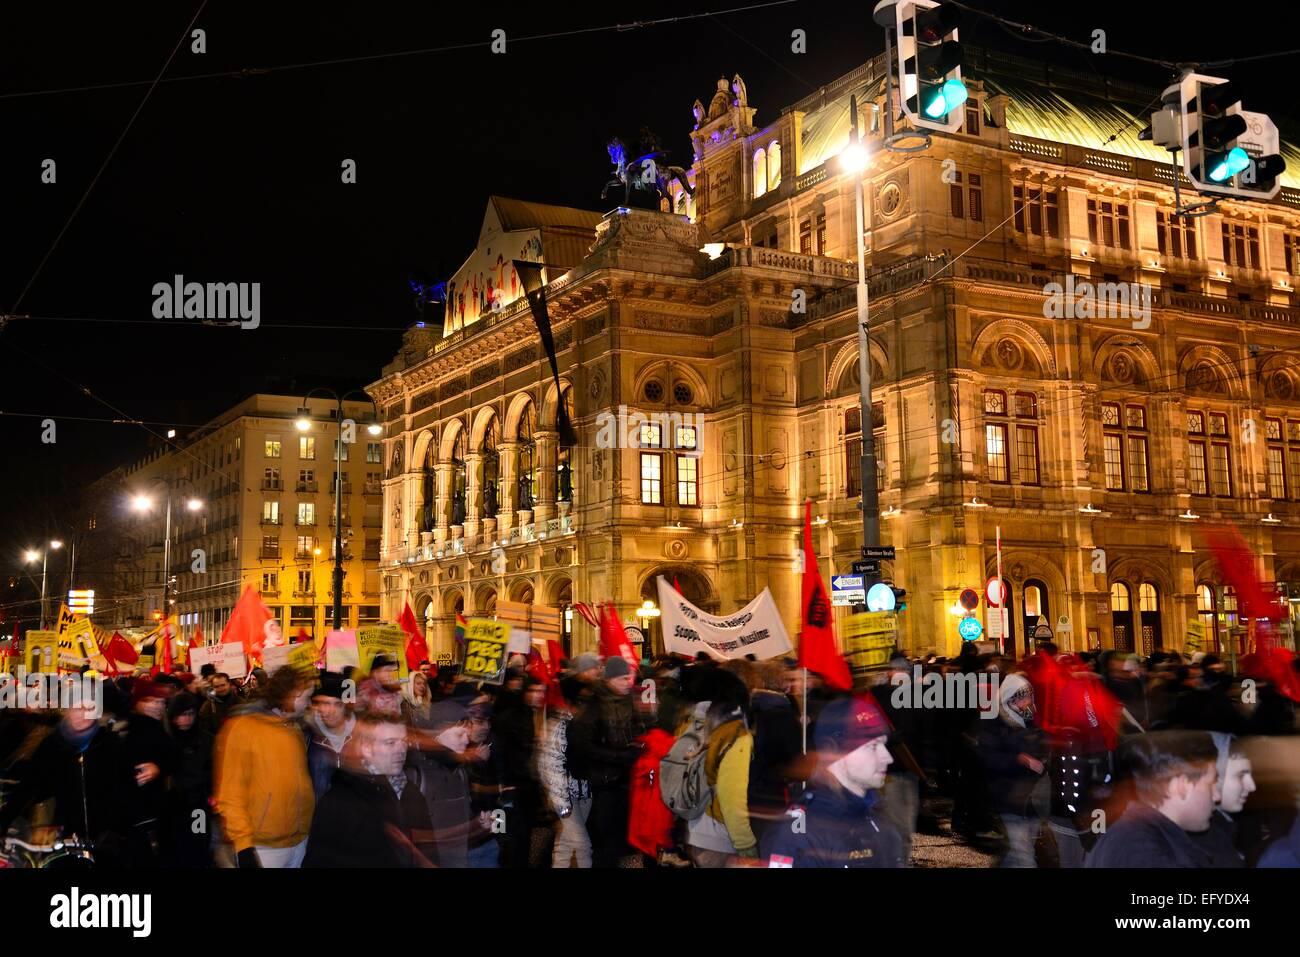 Demonstration against PEGIDA at the Opernring, Innere Stadt, Vienna, Austria - Stock Image